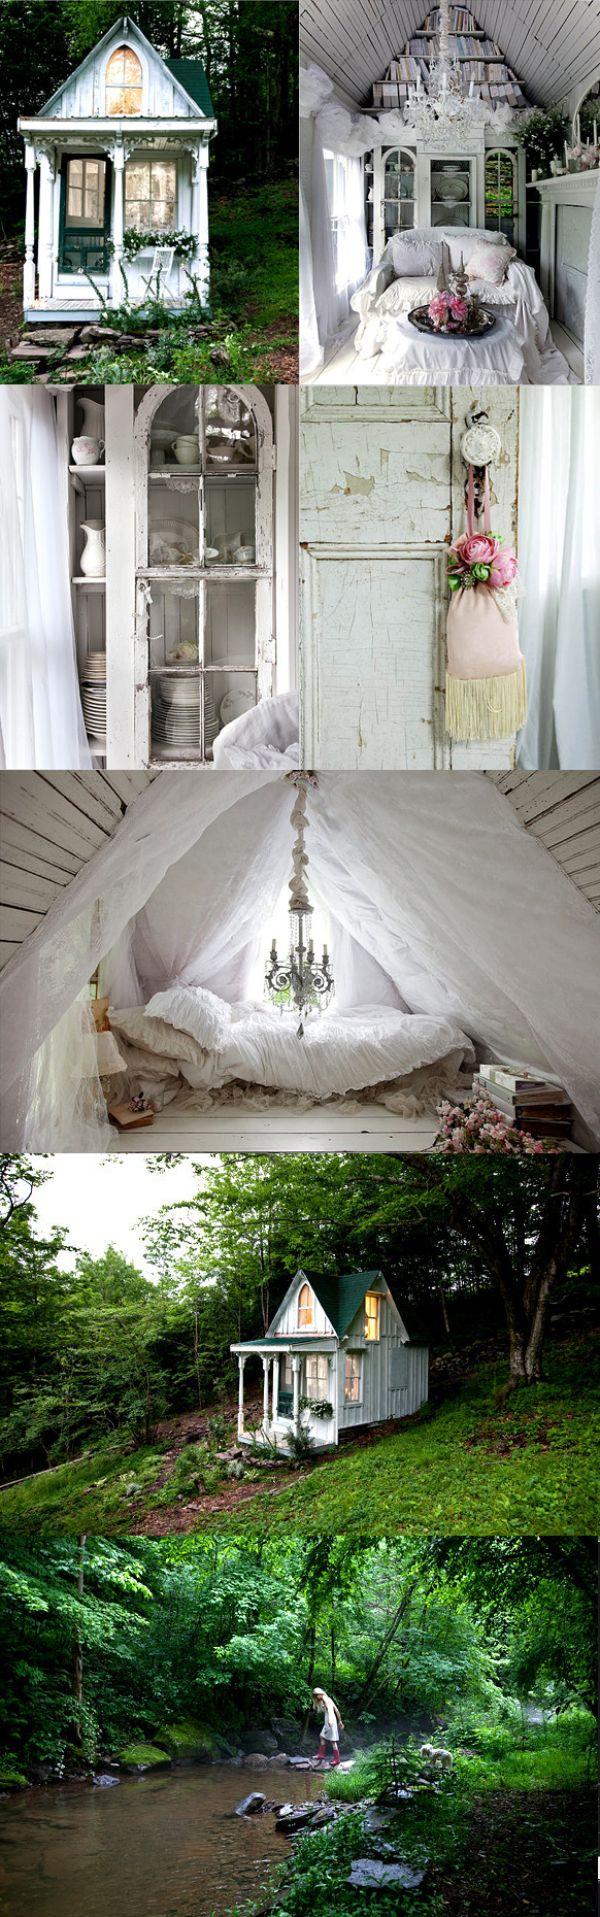 Little Victorian House - love the white scheme